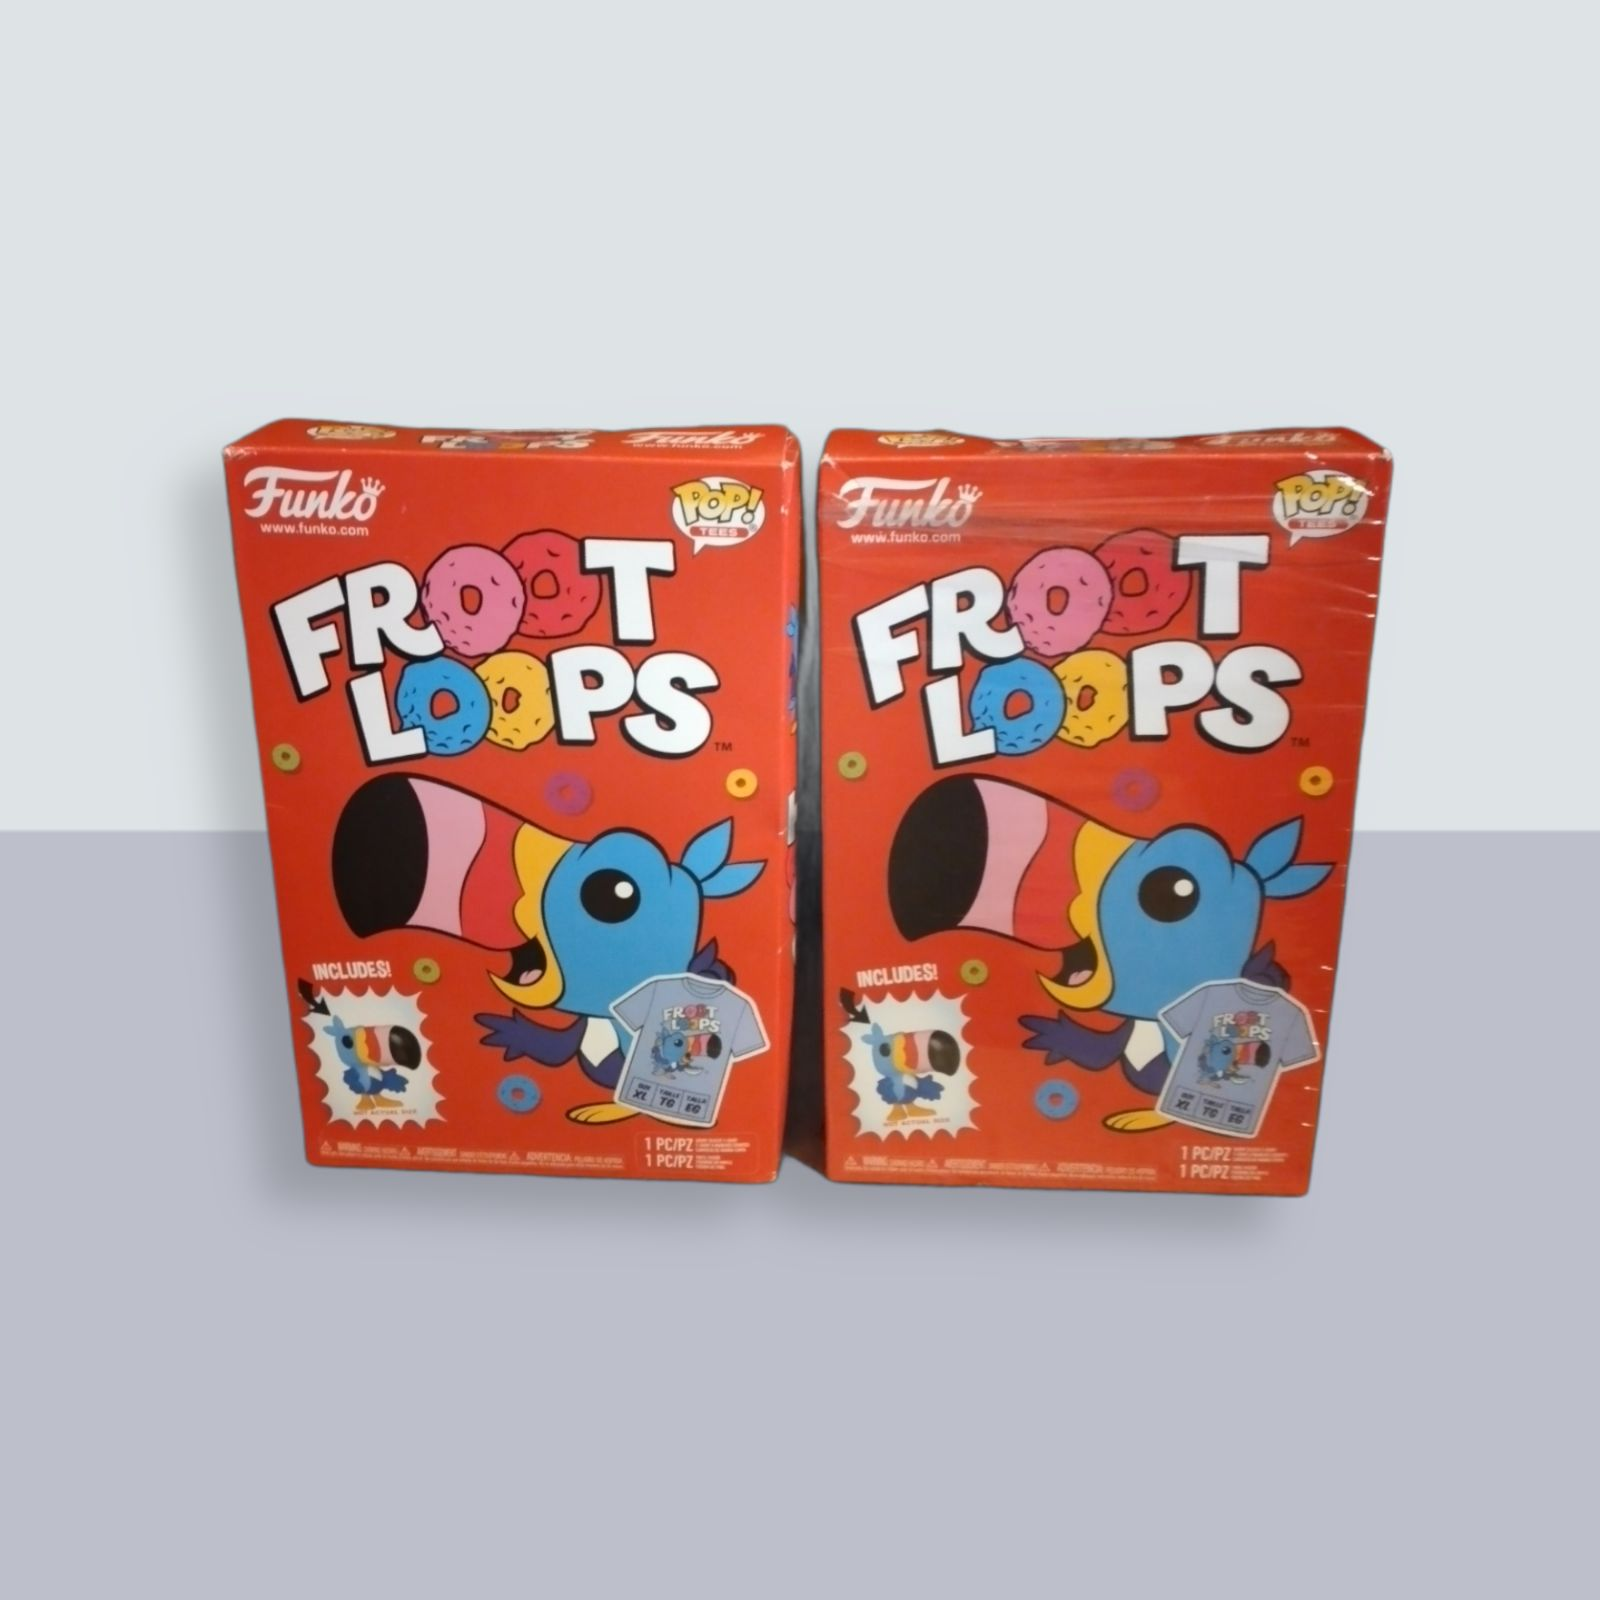 New Sealed Fruit Loops Funko Tshirt Pop